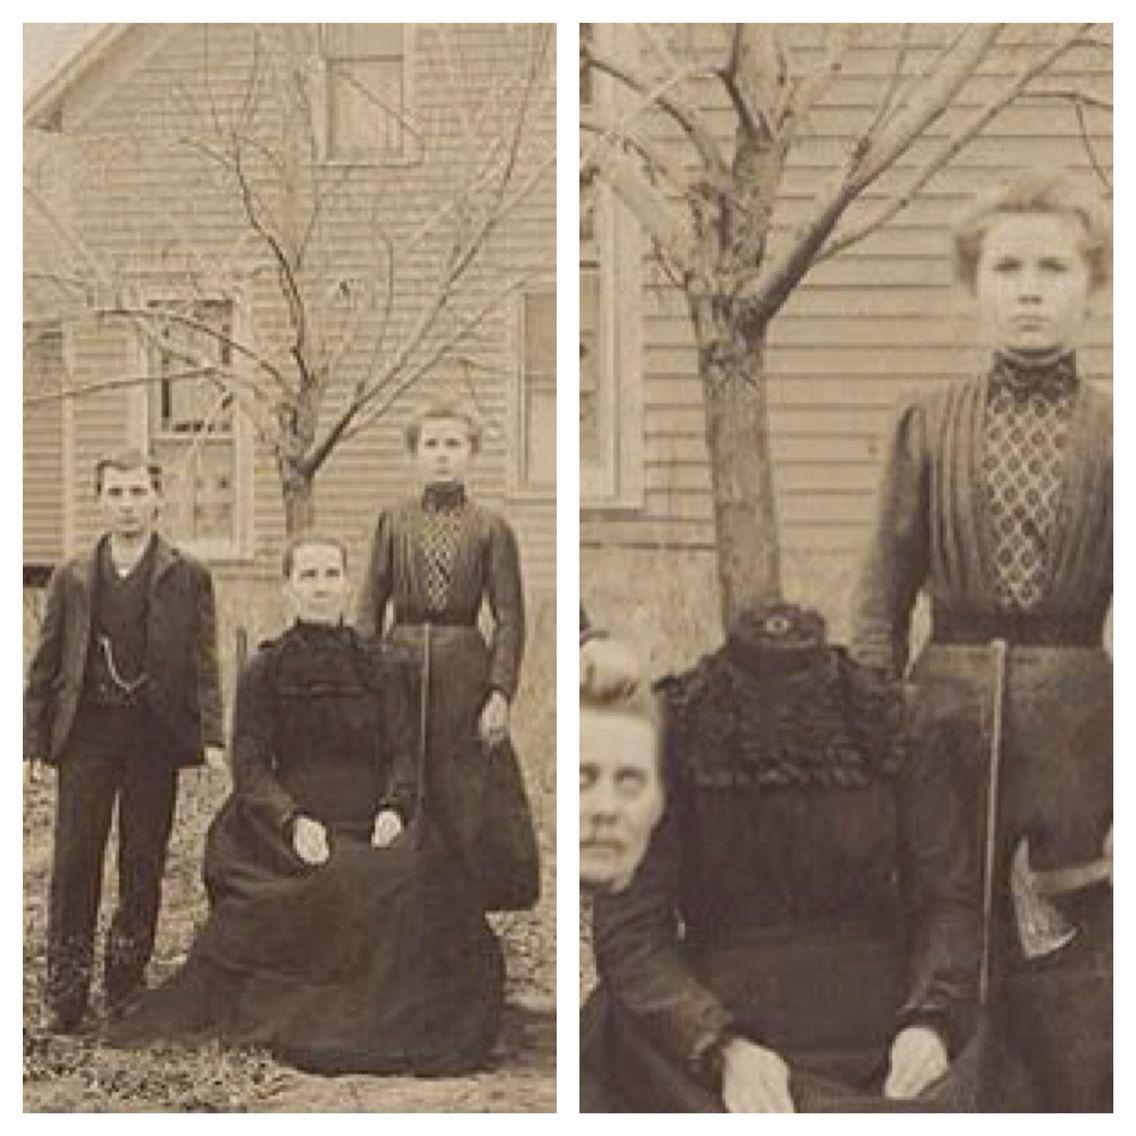 Buckley Family Halloween Beheading : the original. The photograph ...